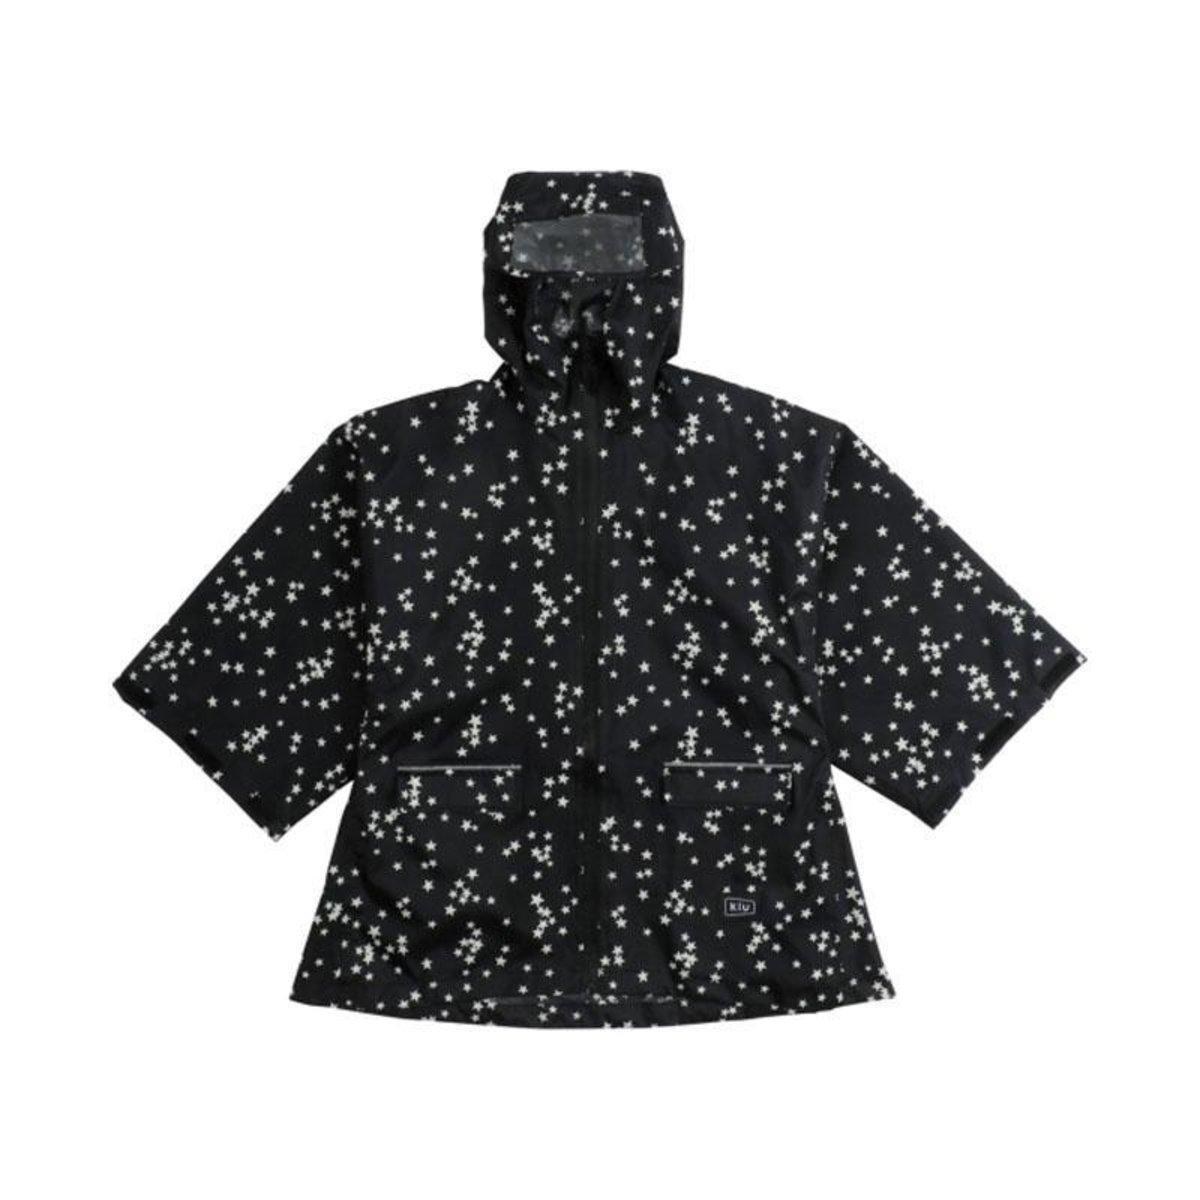 KiU 兒童雨衣 日本品牌 - 星塵 STARDUST